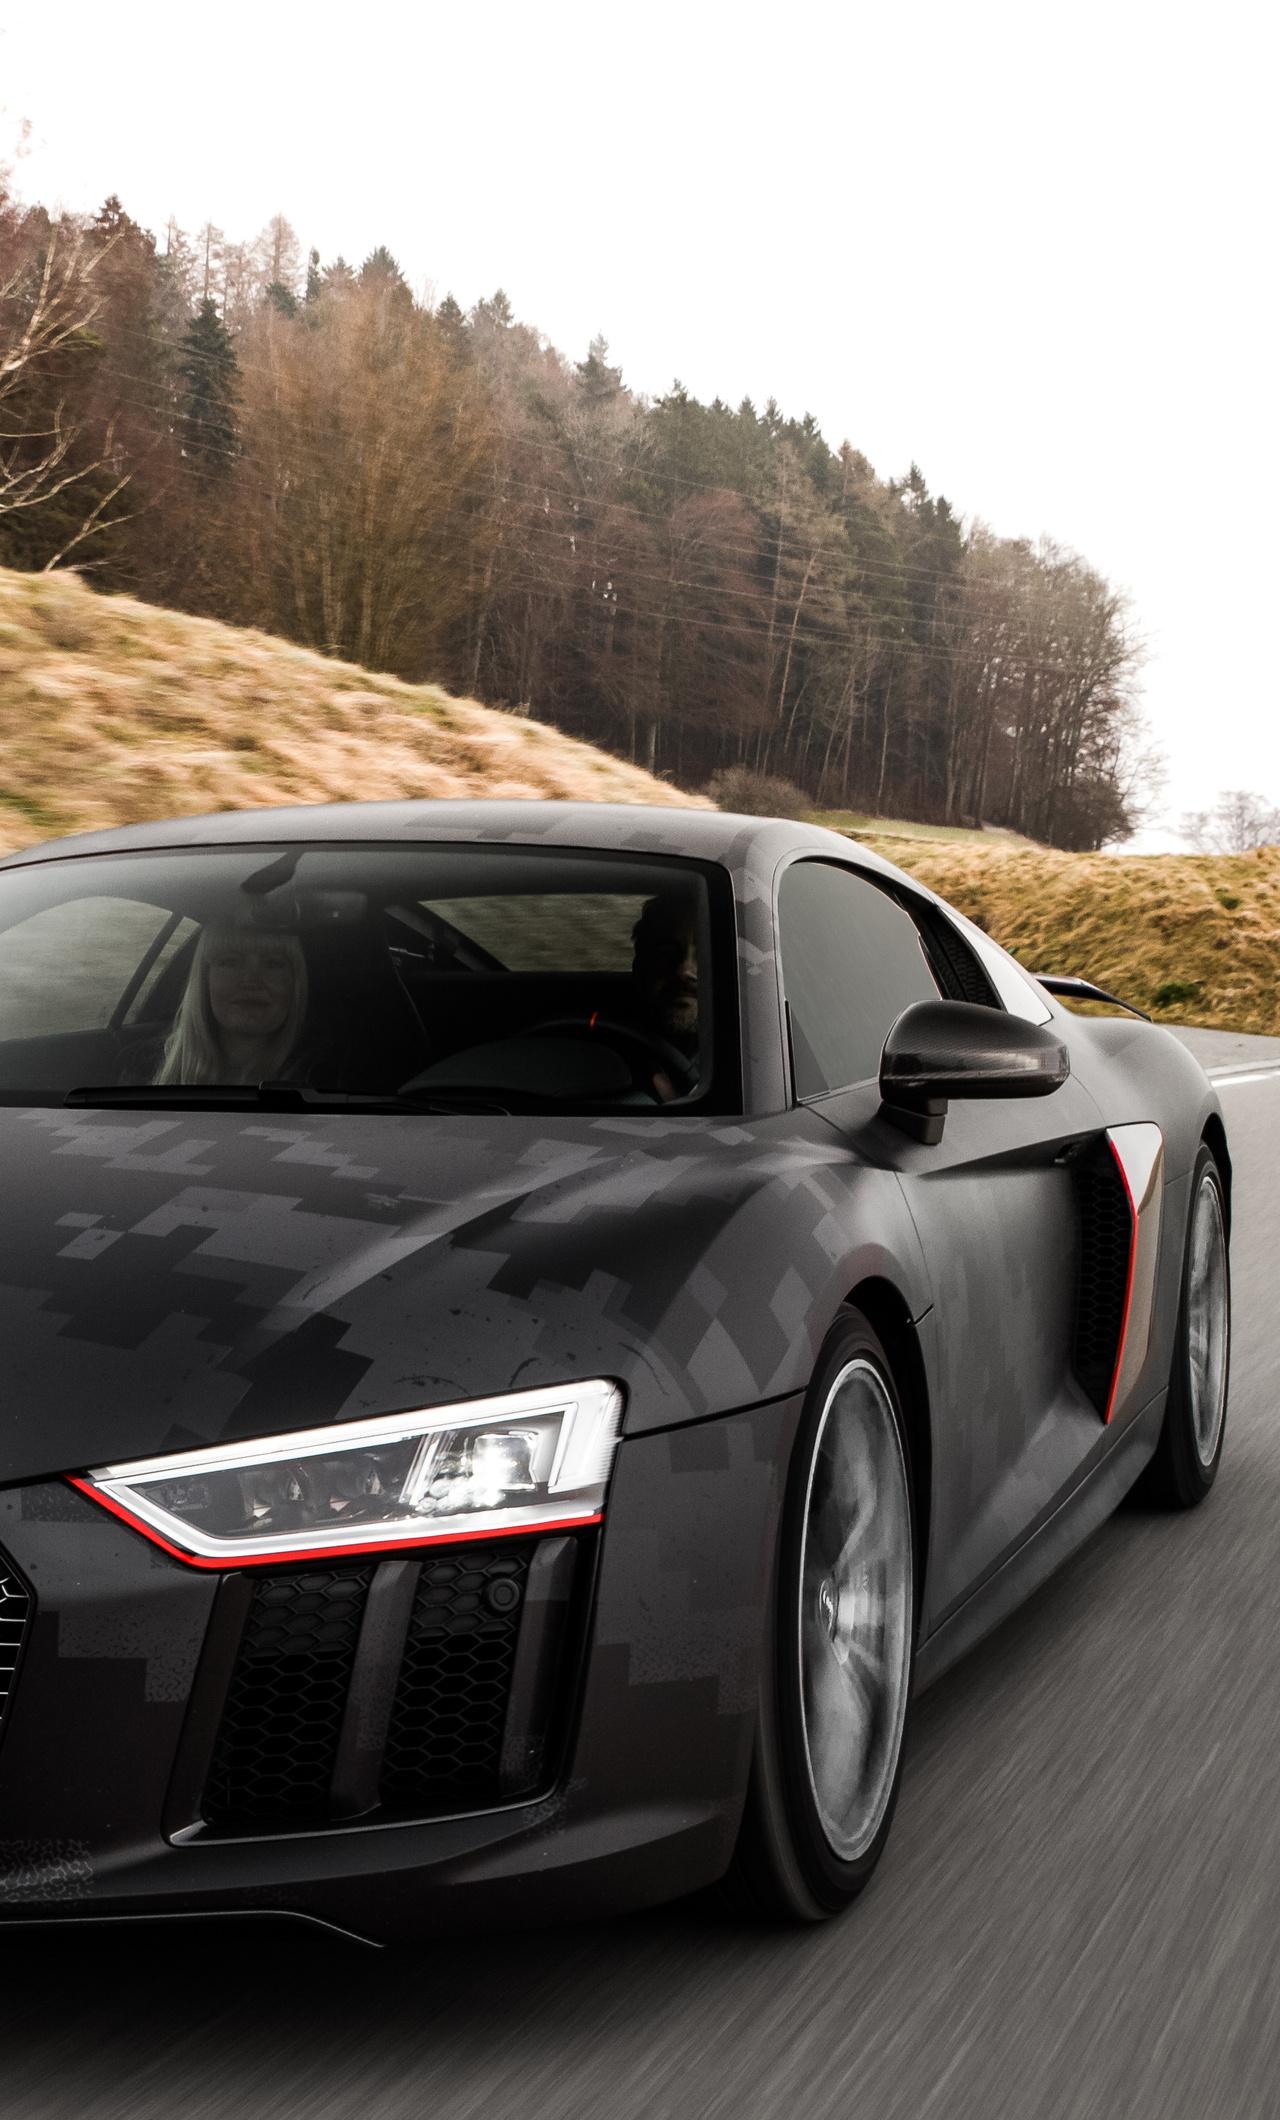 1280x2120 Black Audi R8 V10 Plus Iphone 6 Hd 4k Wallpapers